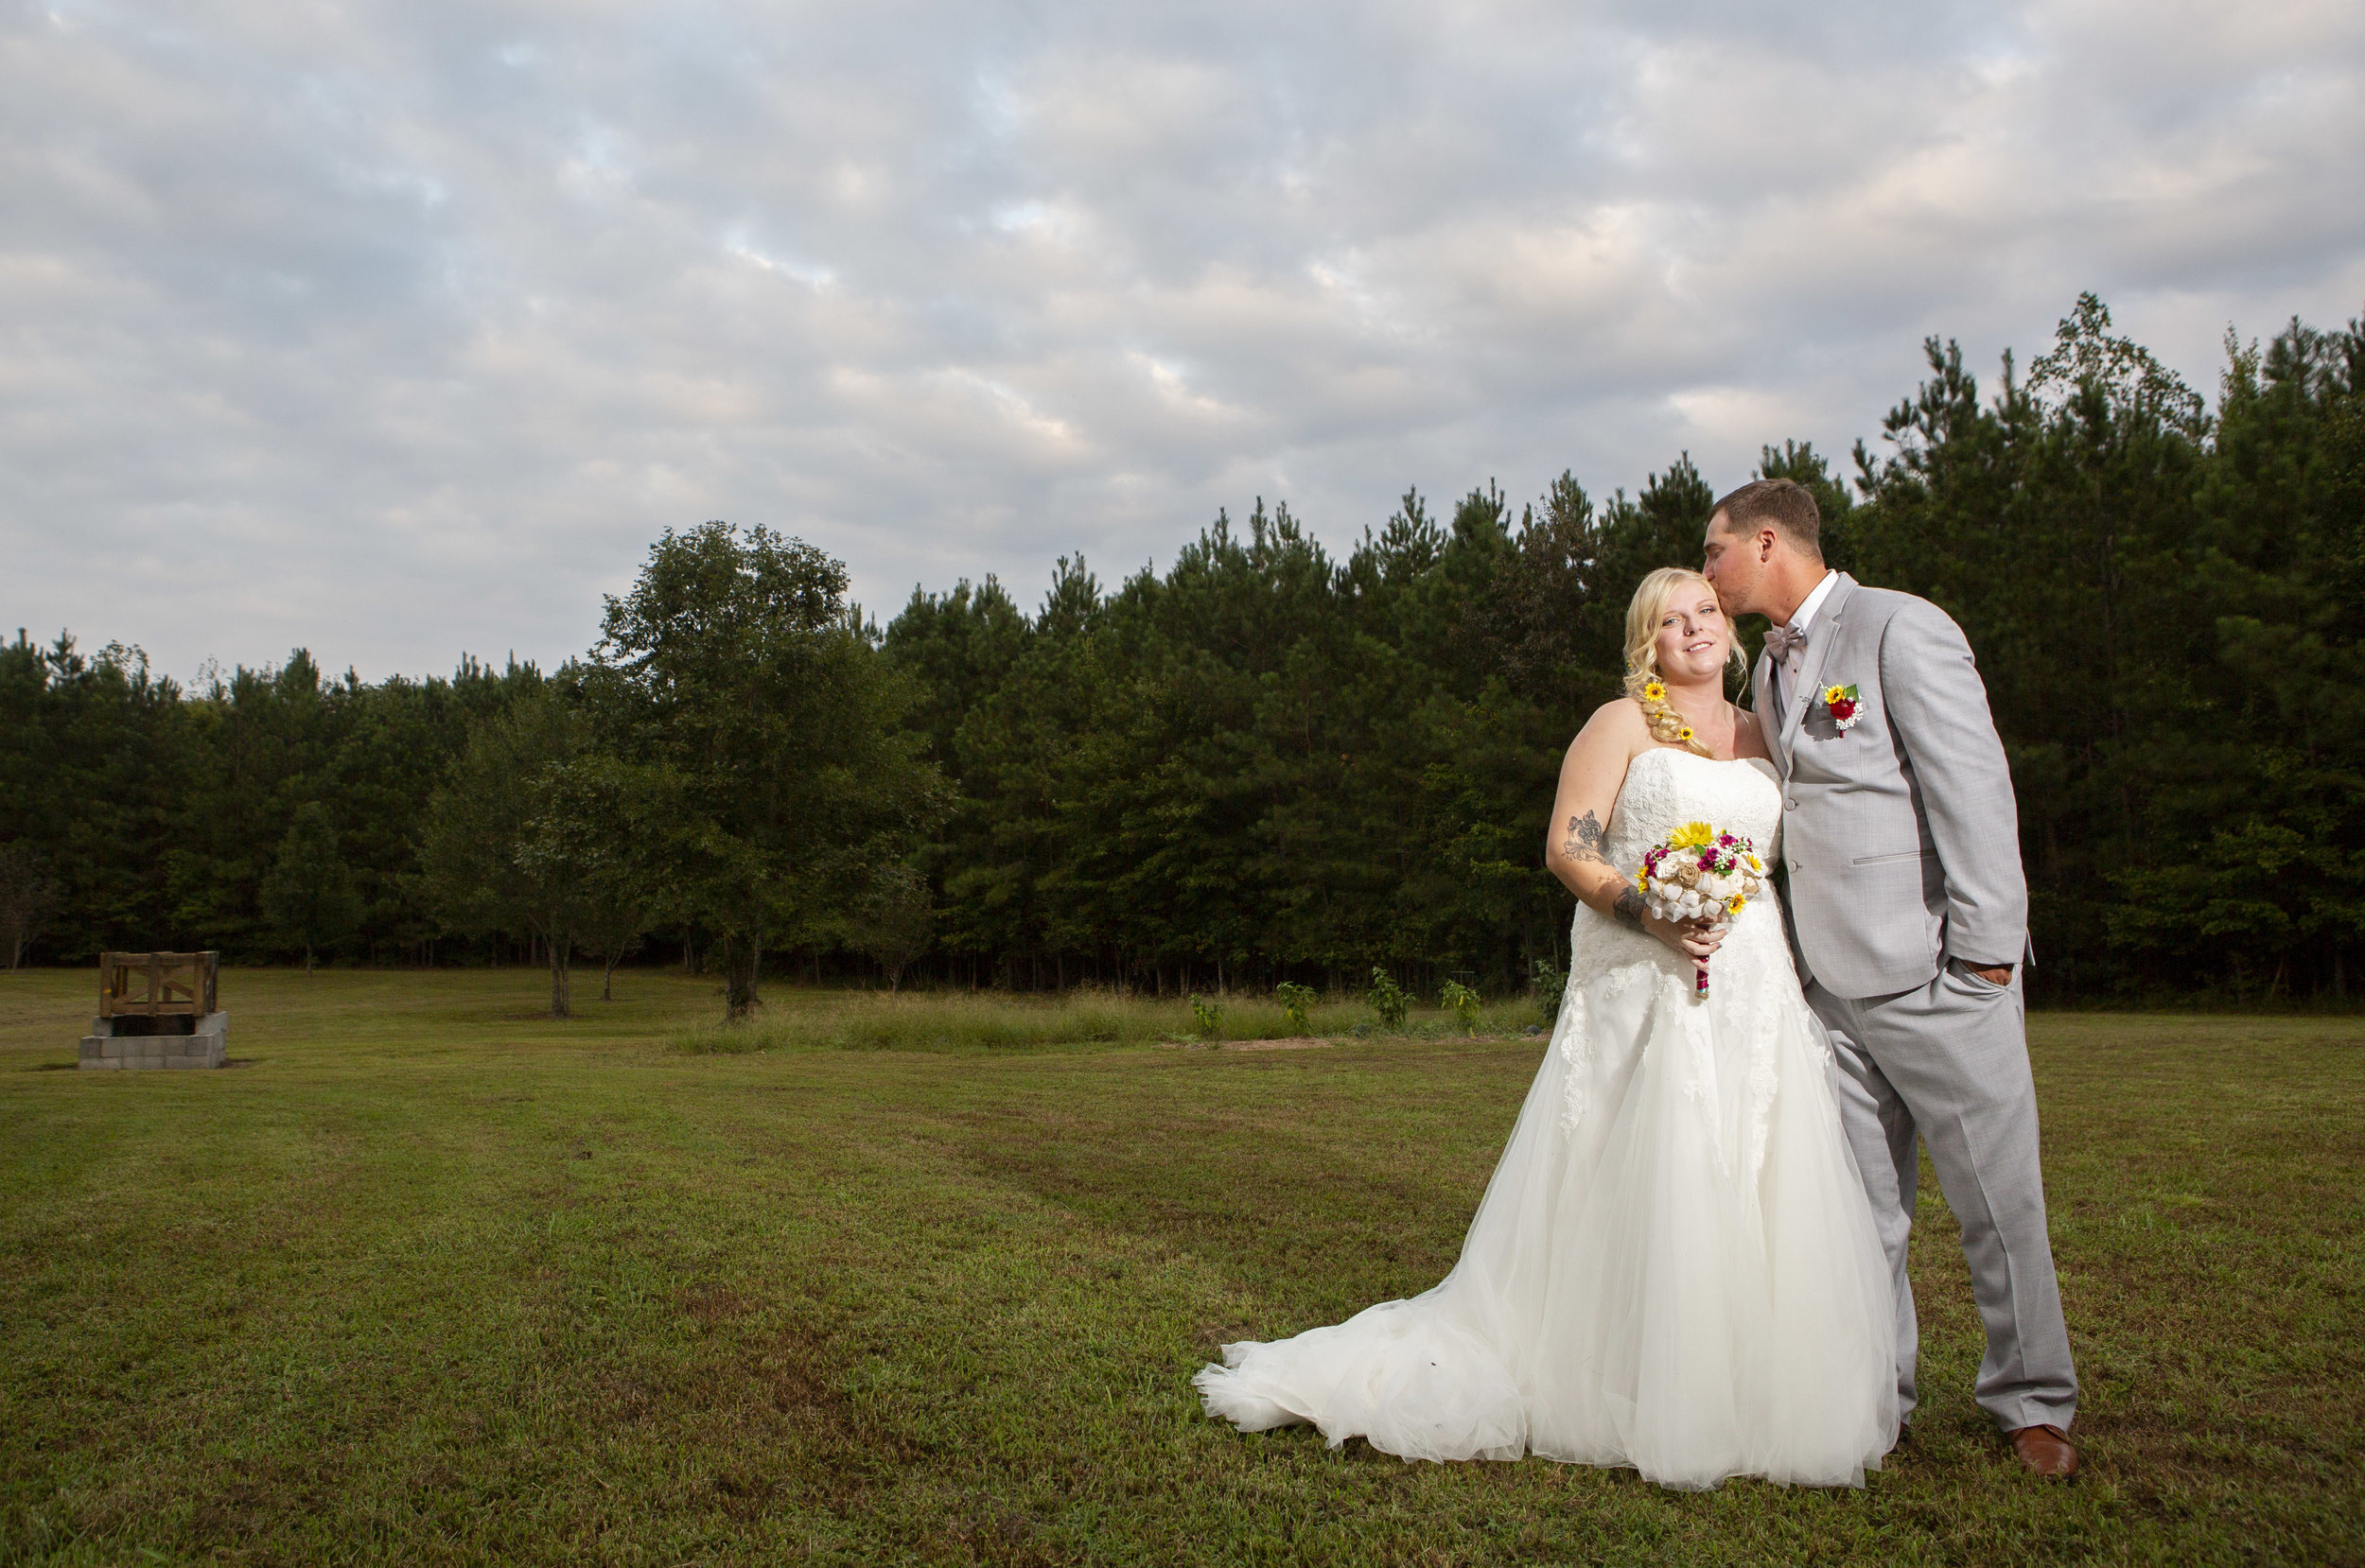 surry-wedding-01.jpg